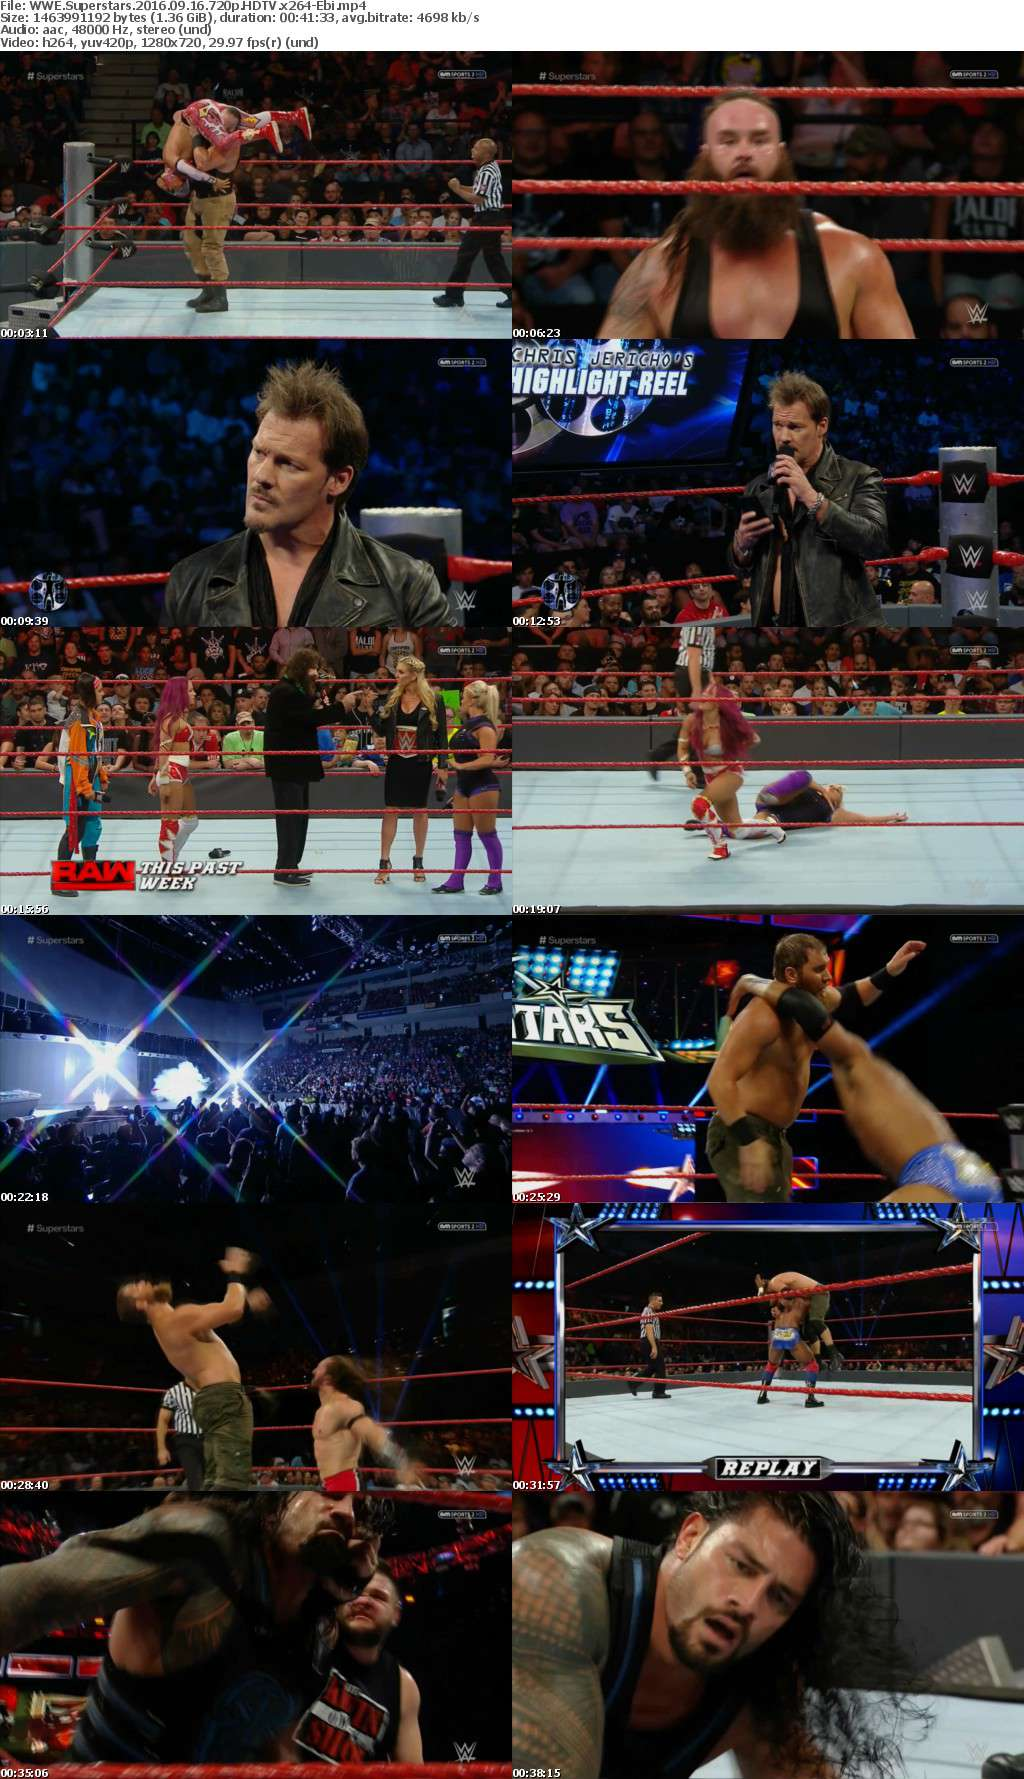 WWE Superstars 2016 09 16 720p HDTV x264-Ebi